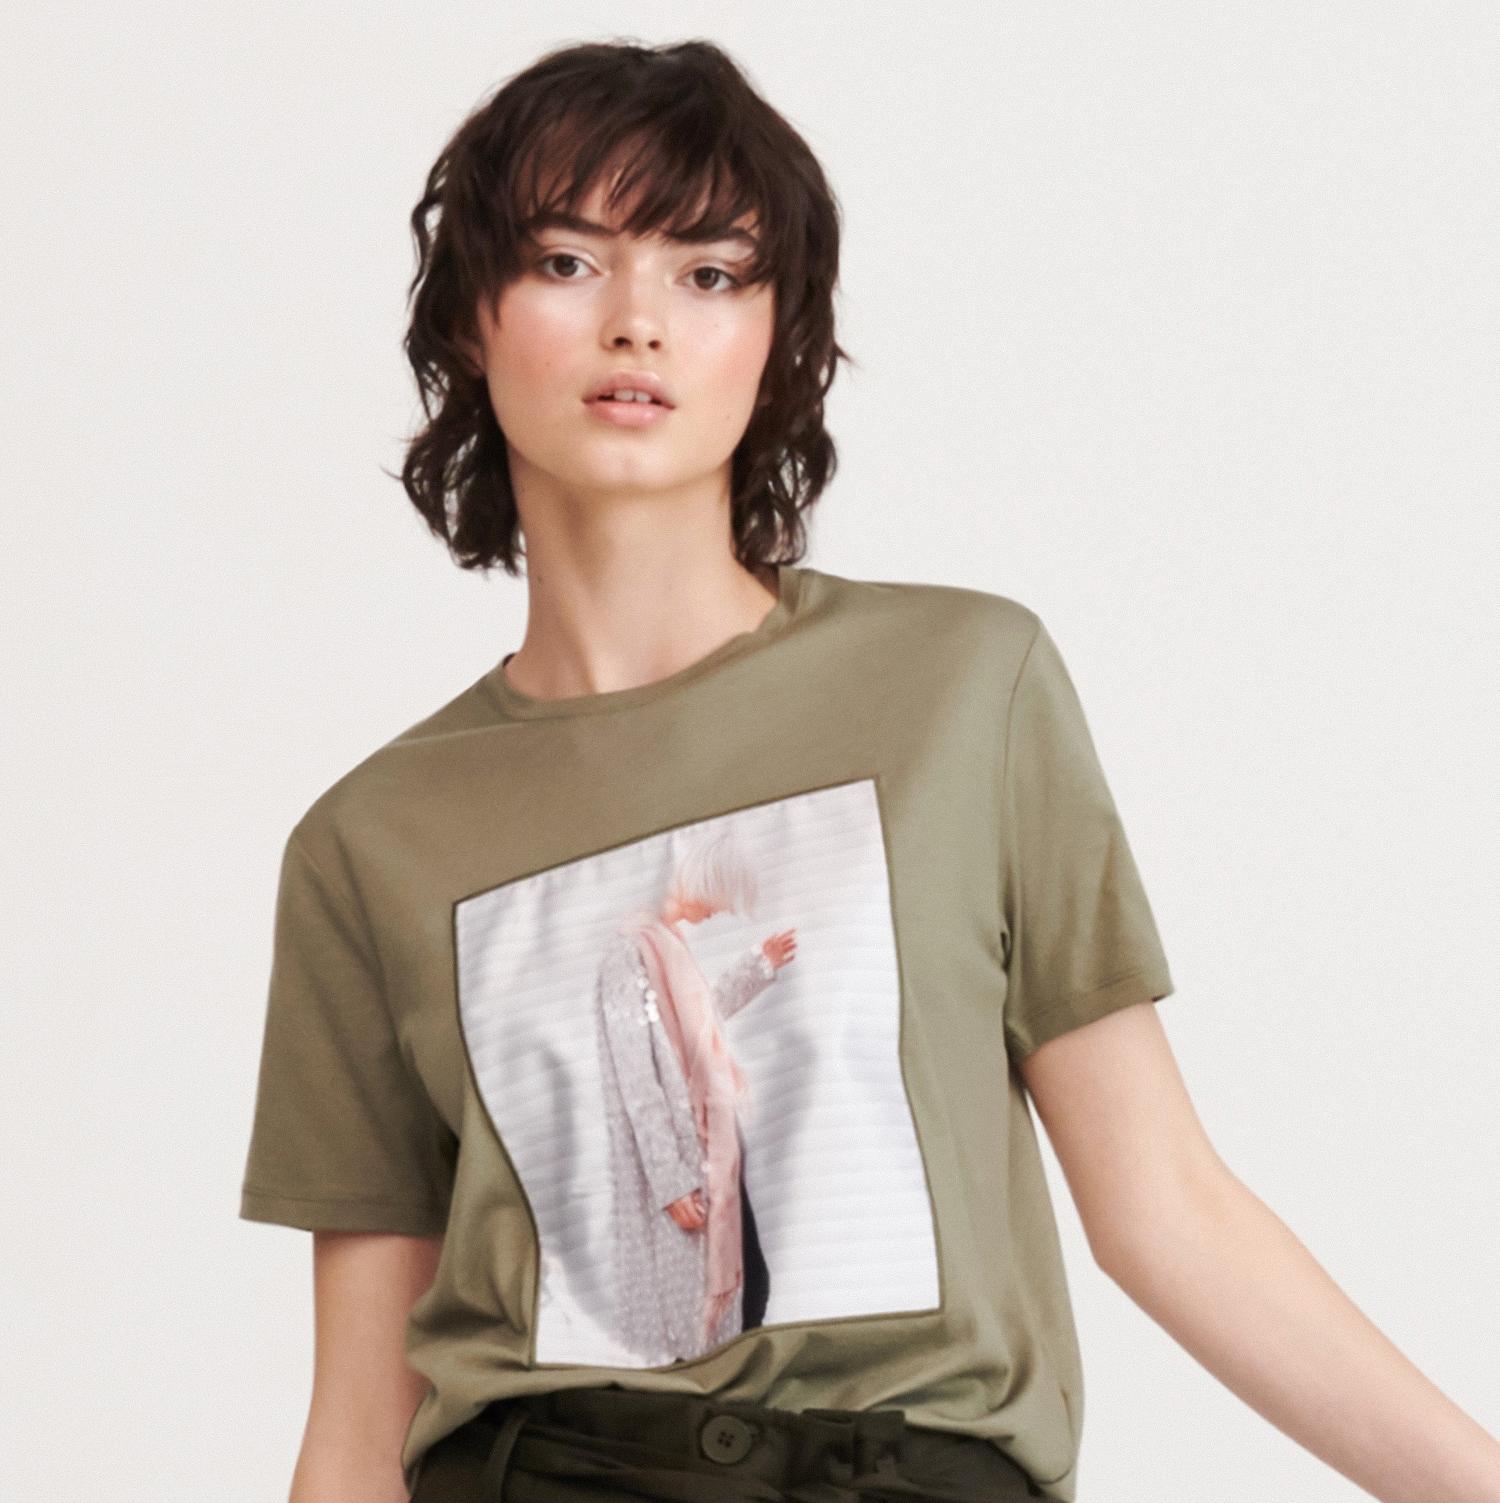 Reserved - Tričko zo zmesi bavlny a modalu - Khaki